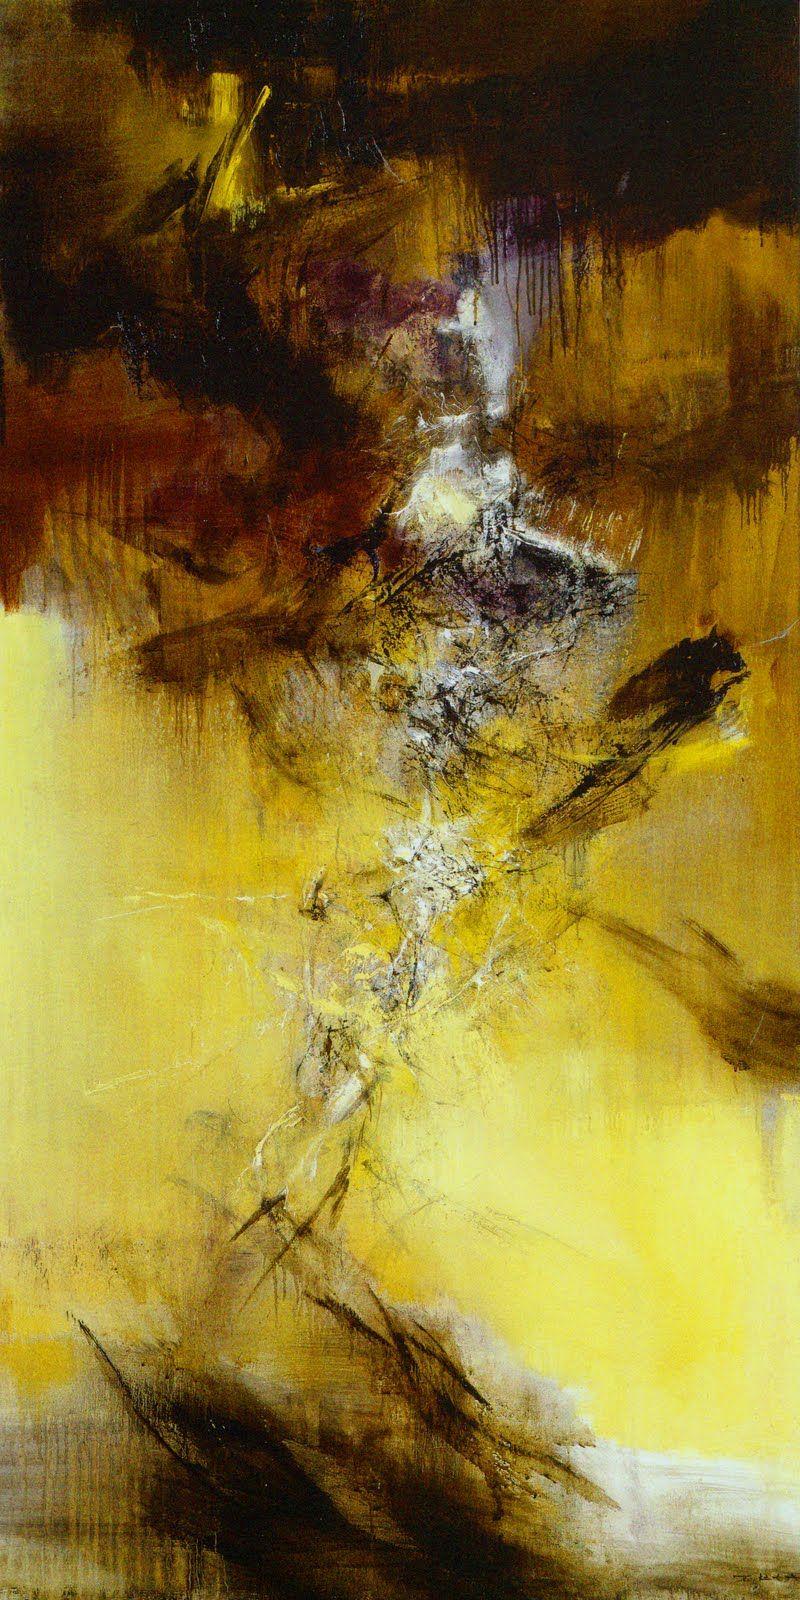 Zao Wou Ki Huile Sur Toile 1969 Peinture Abstraite Peinture